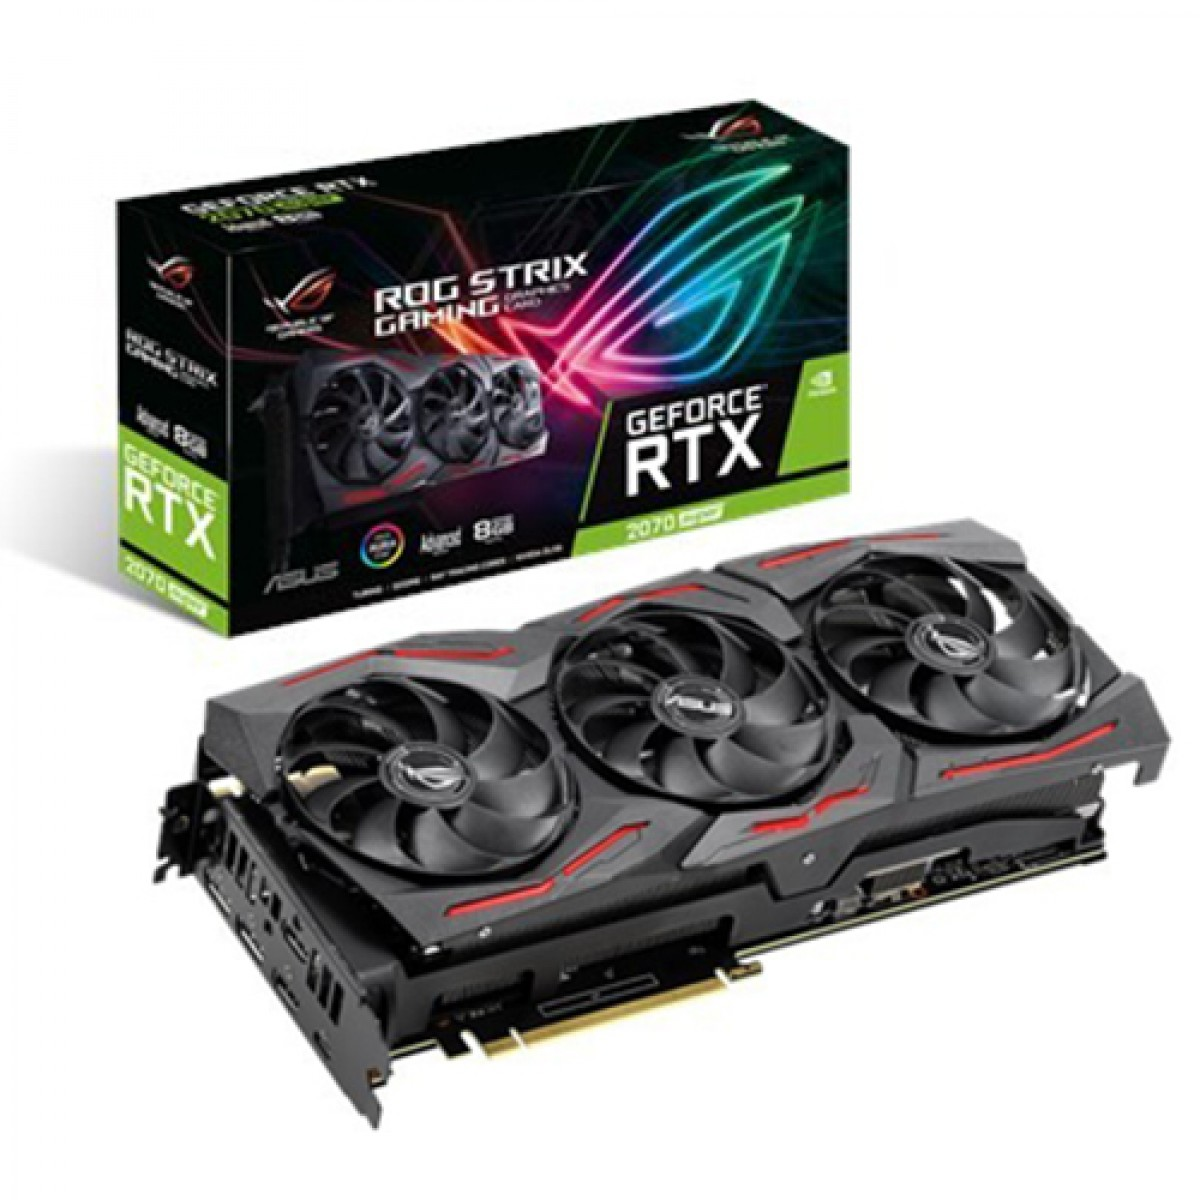 Placa de Vídeo Asus, Rog Strix GeForce, RTX 2070 Super Advanced Edition, 8GB, GDDR6, 256Bit, ROG-STRIX-RTX2070S-A8G-GAMING